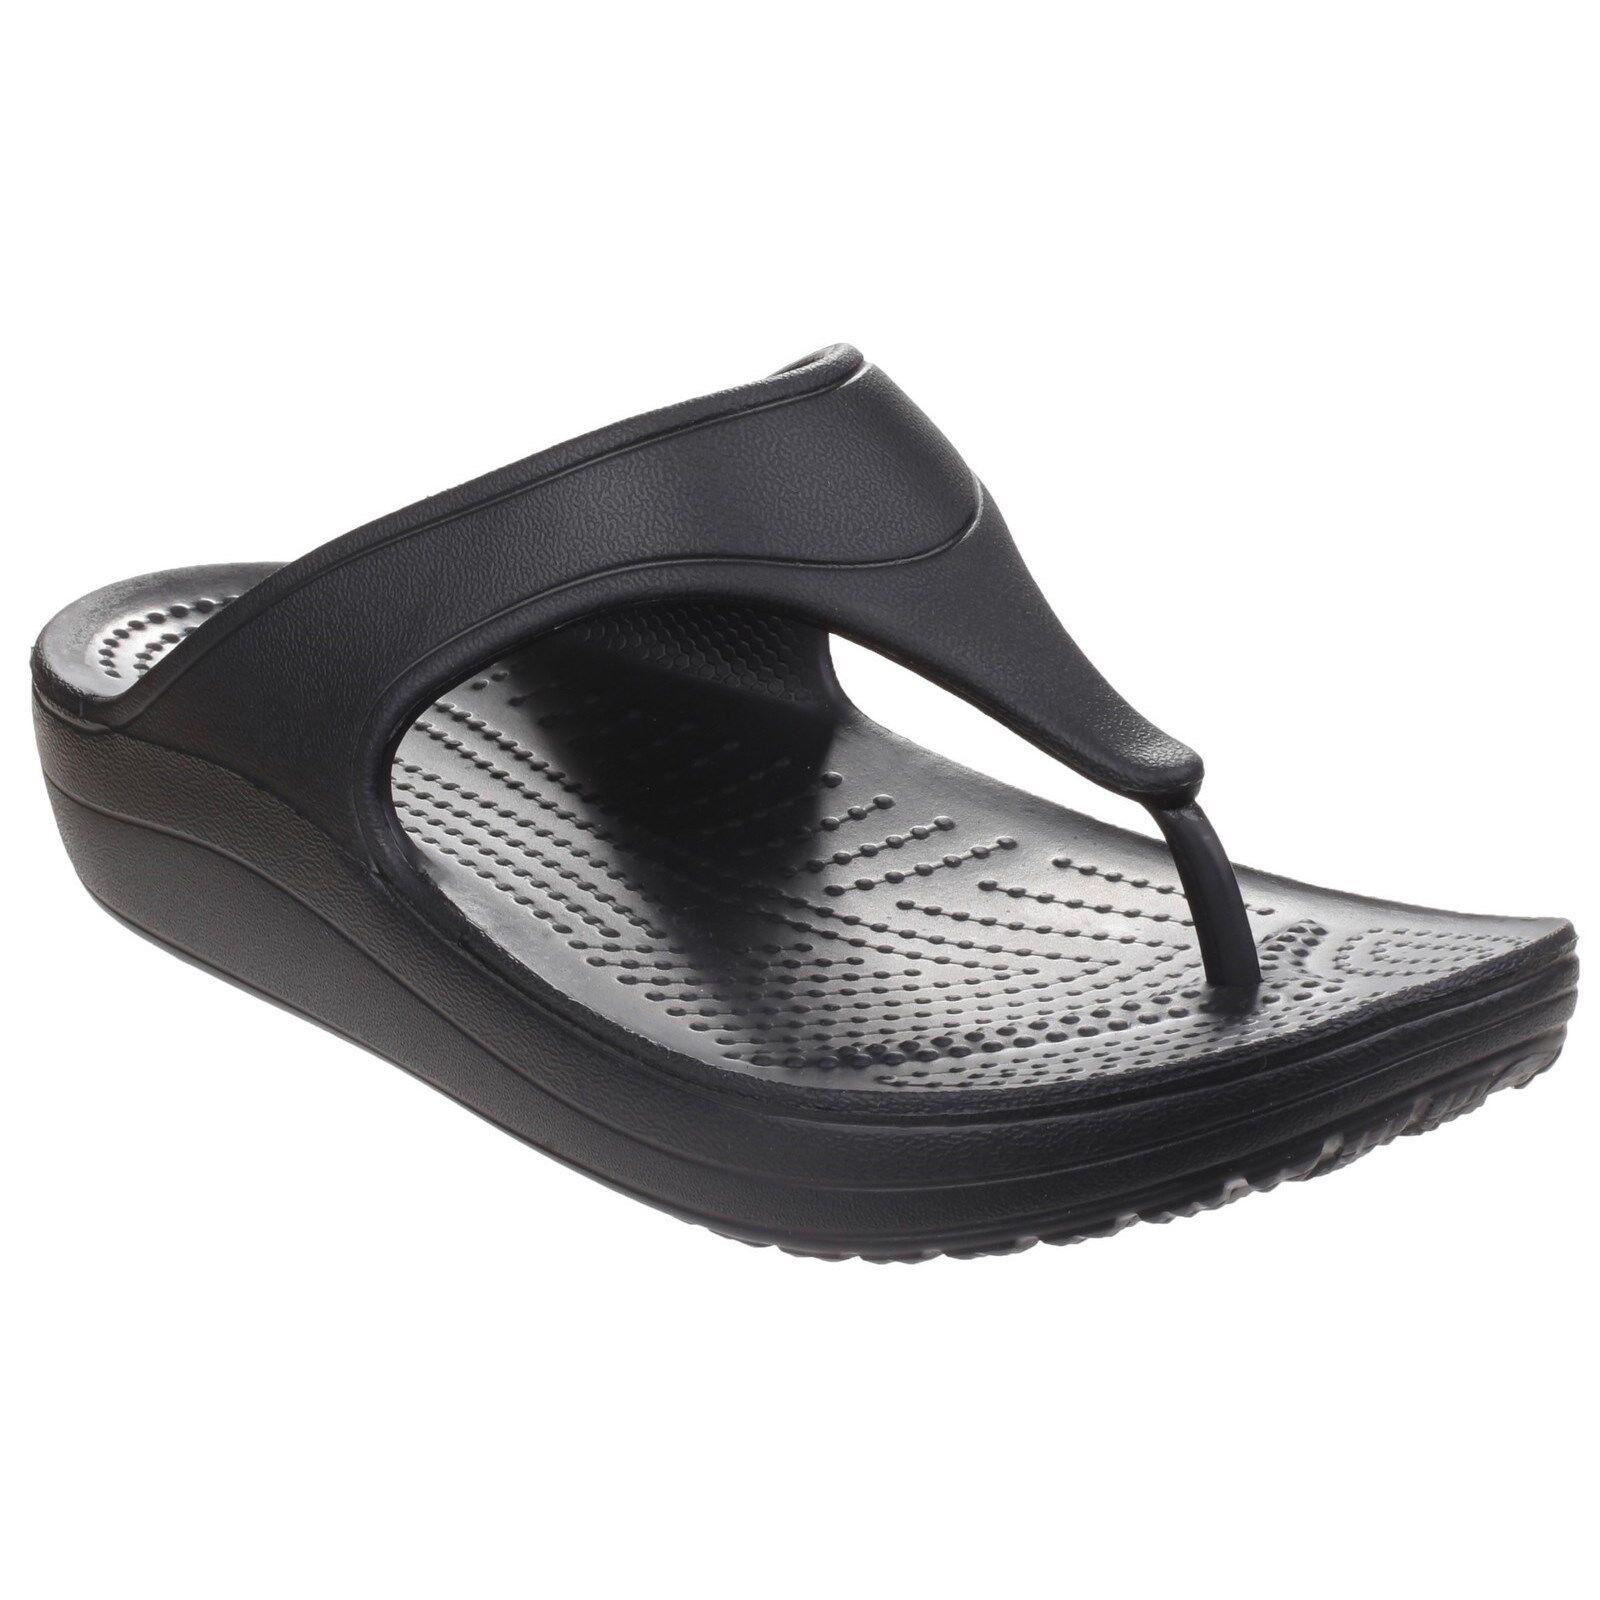 557043175ed Crocs Sloane Platform Sandals Womens Croslite Foam Heeled Toe Post Flip  Flops